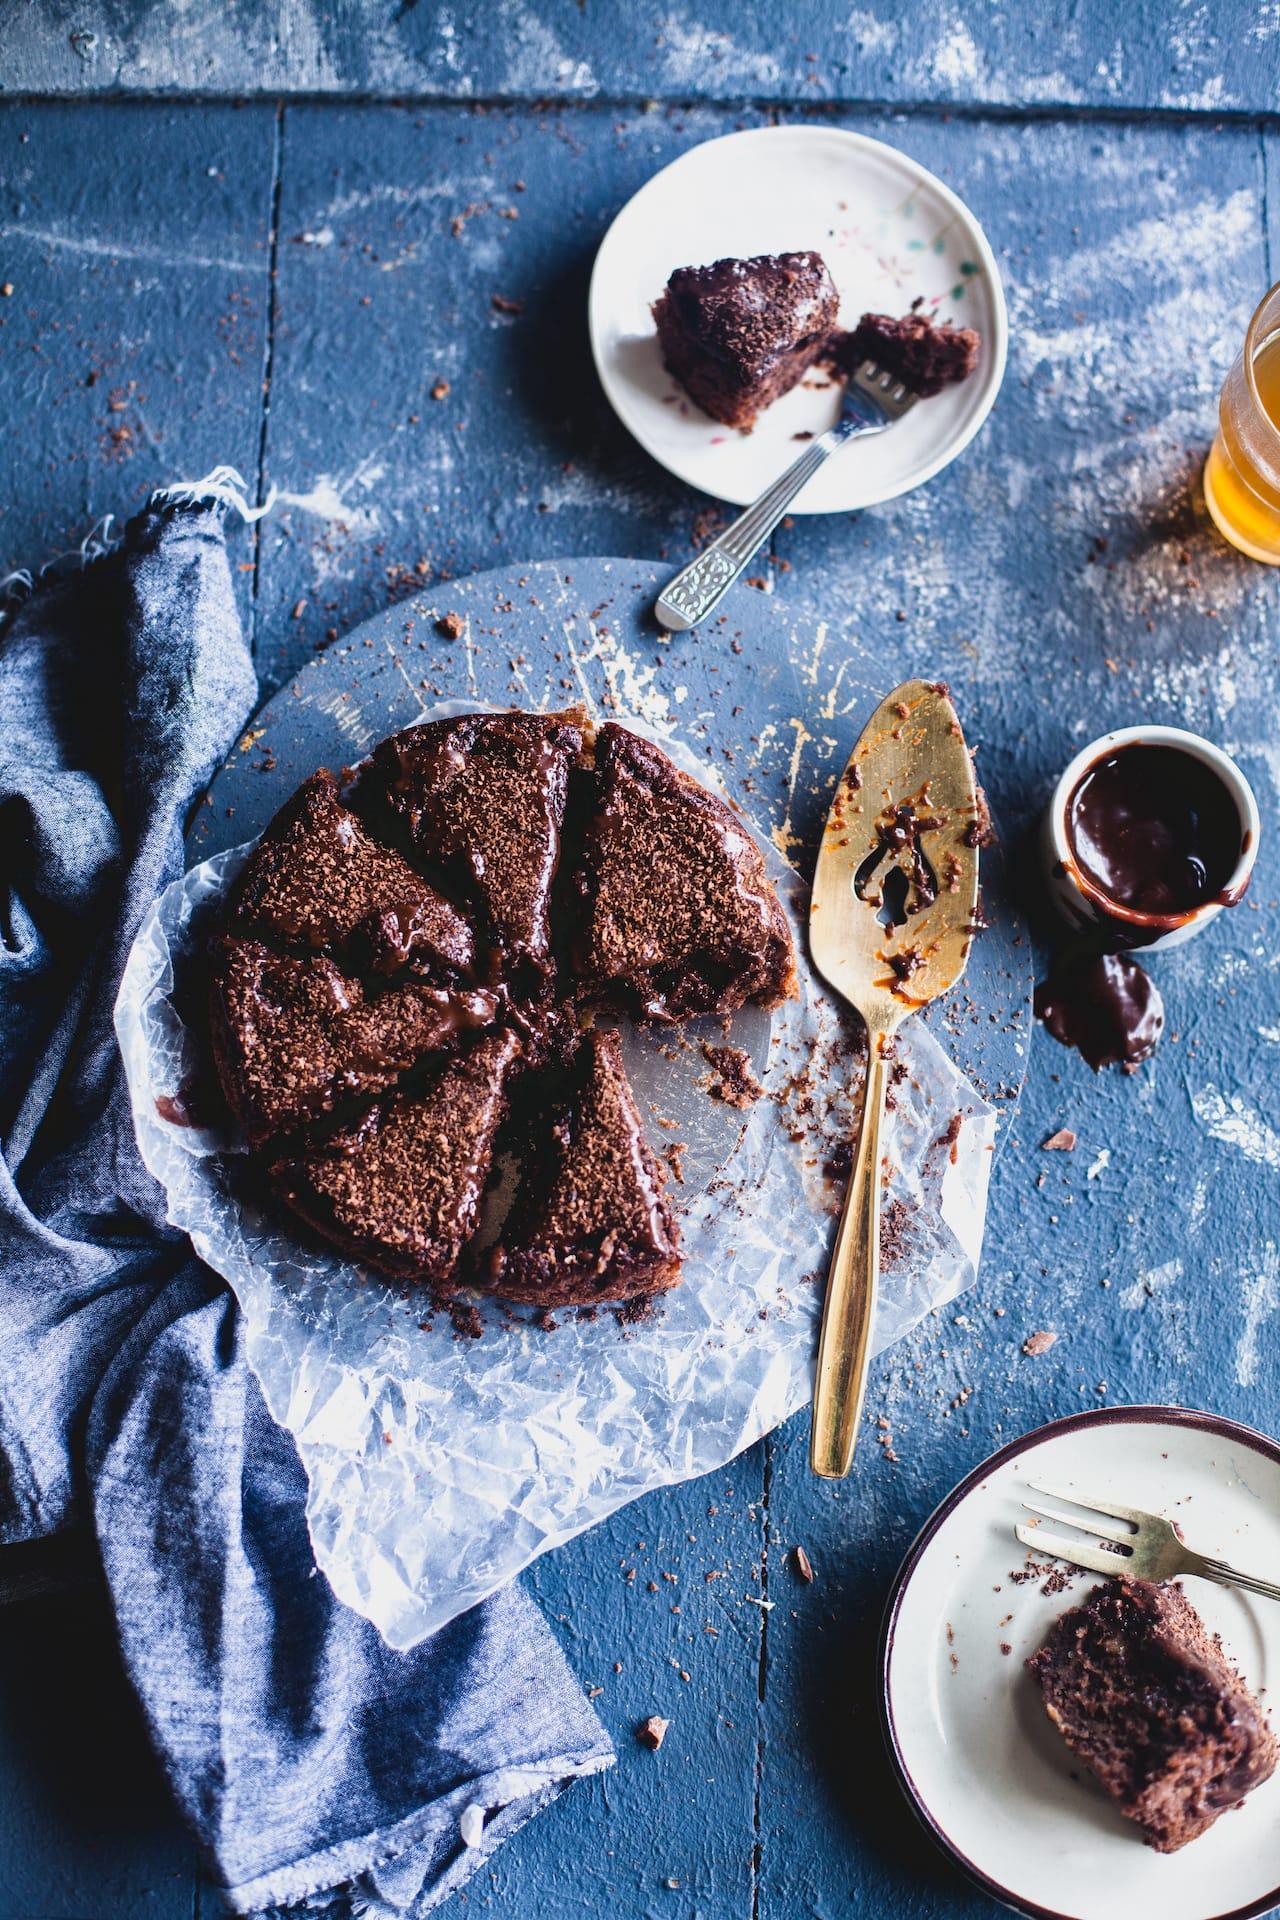 Yogurt Banana Chocolate Cake | Playful Cooking